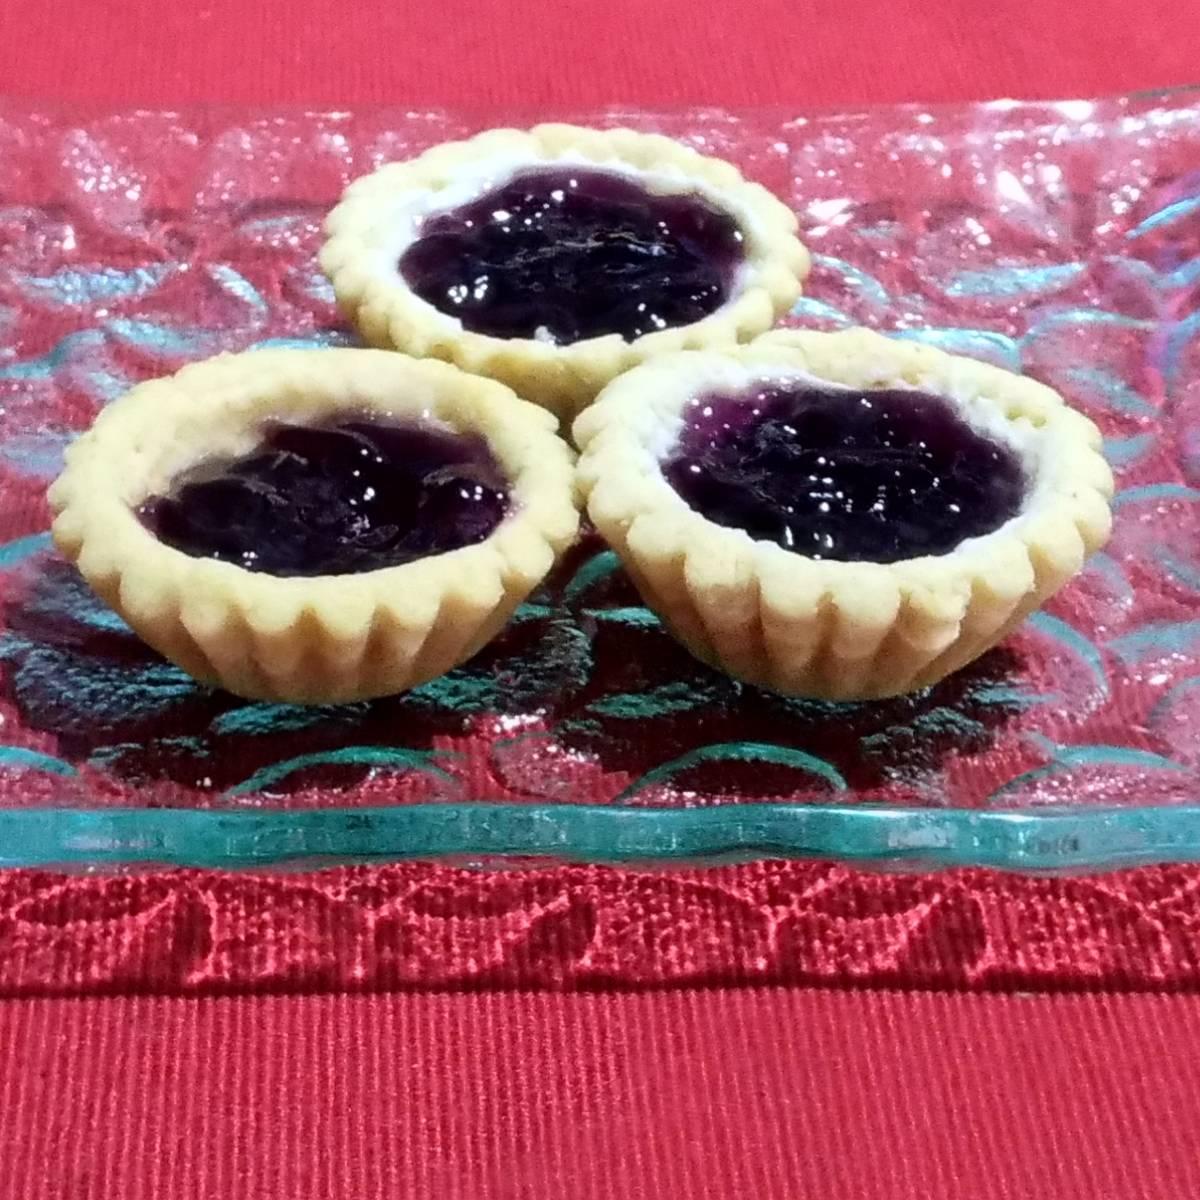 Mini Pie Blueberry Original Crust (paket 3 Pieces)2